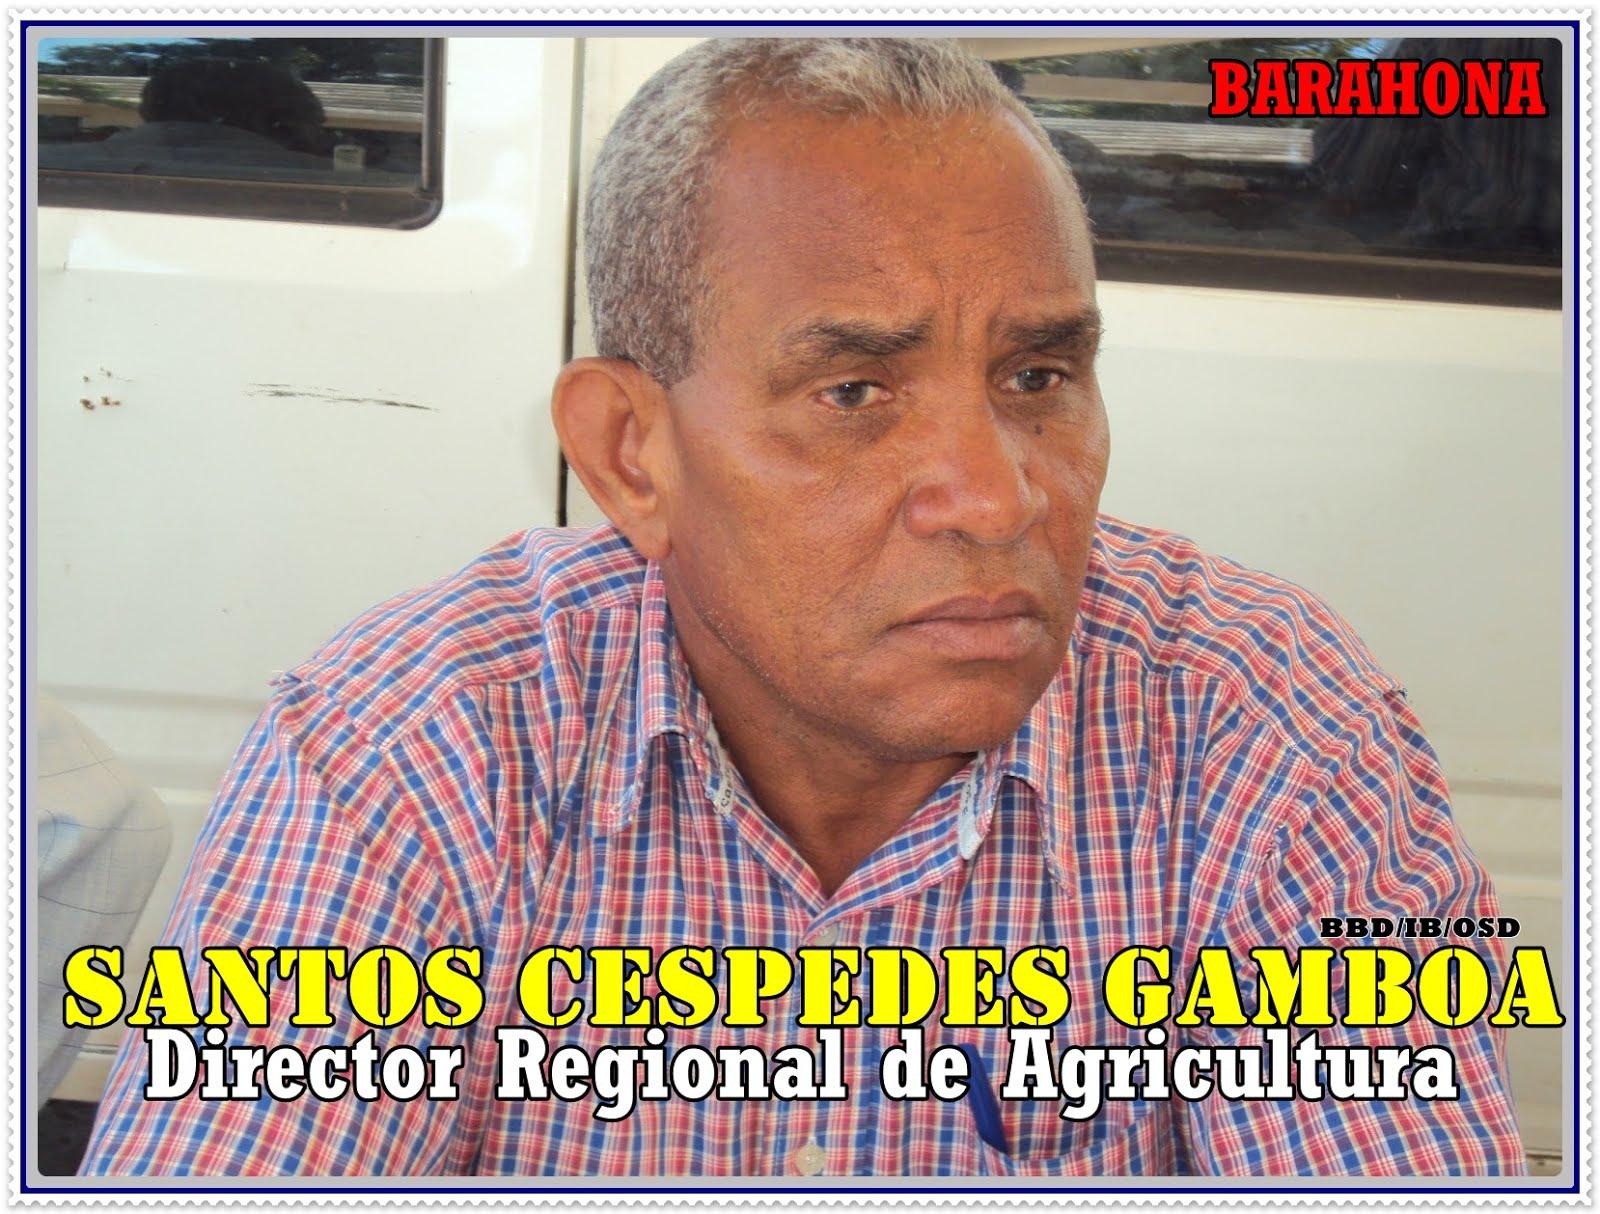 SANTOS CESPEDES GAM BOA, DIRECTOR REGIONAL DE AGRICULTURA